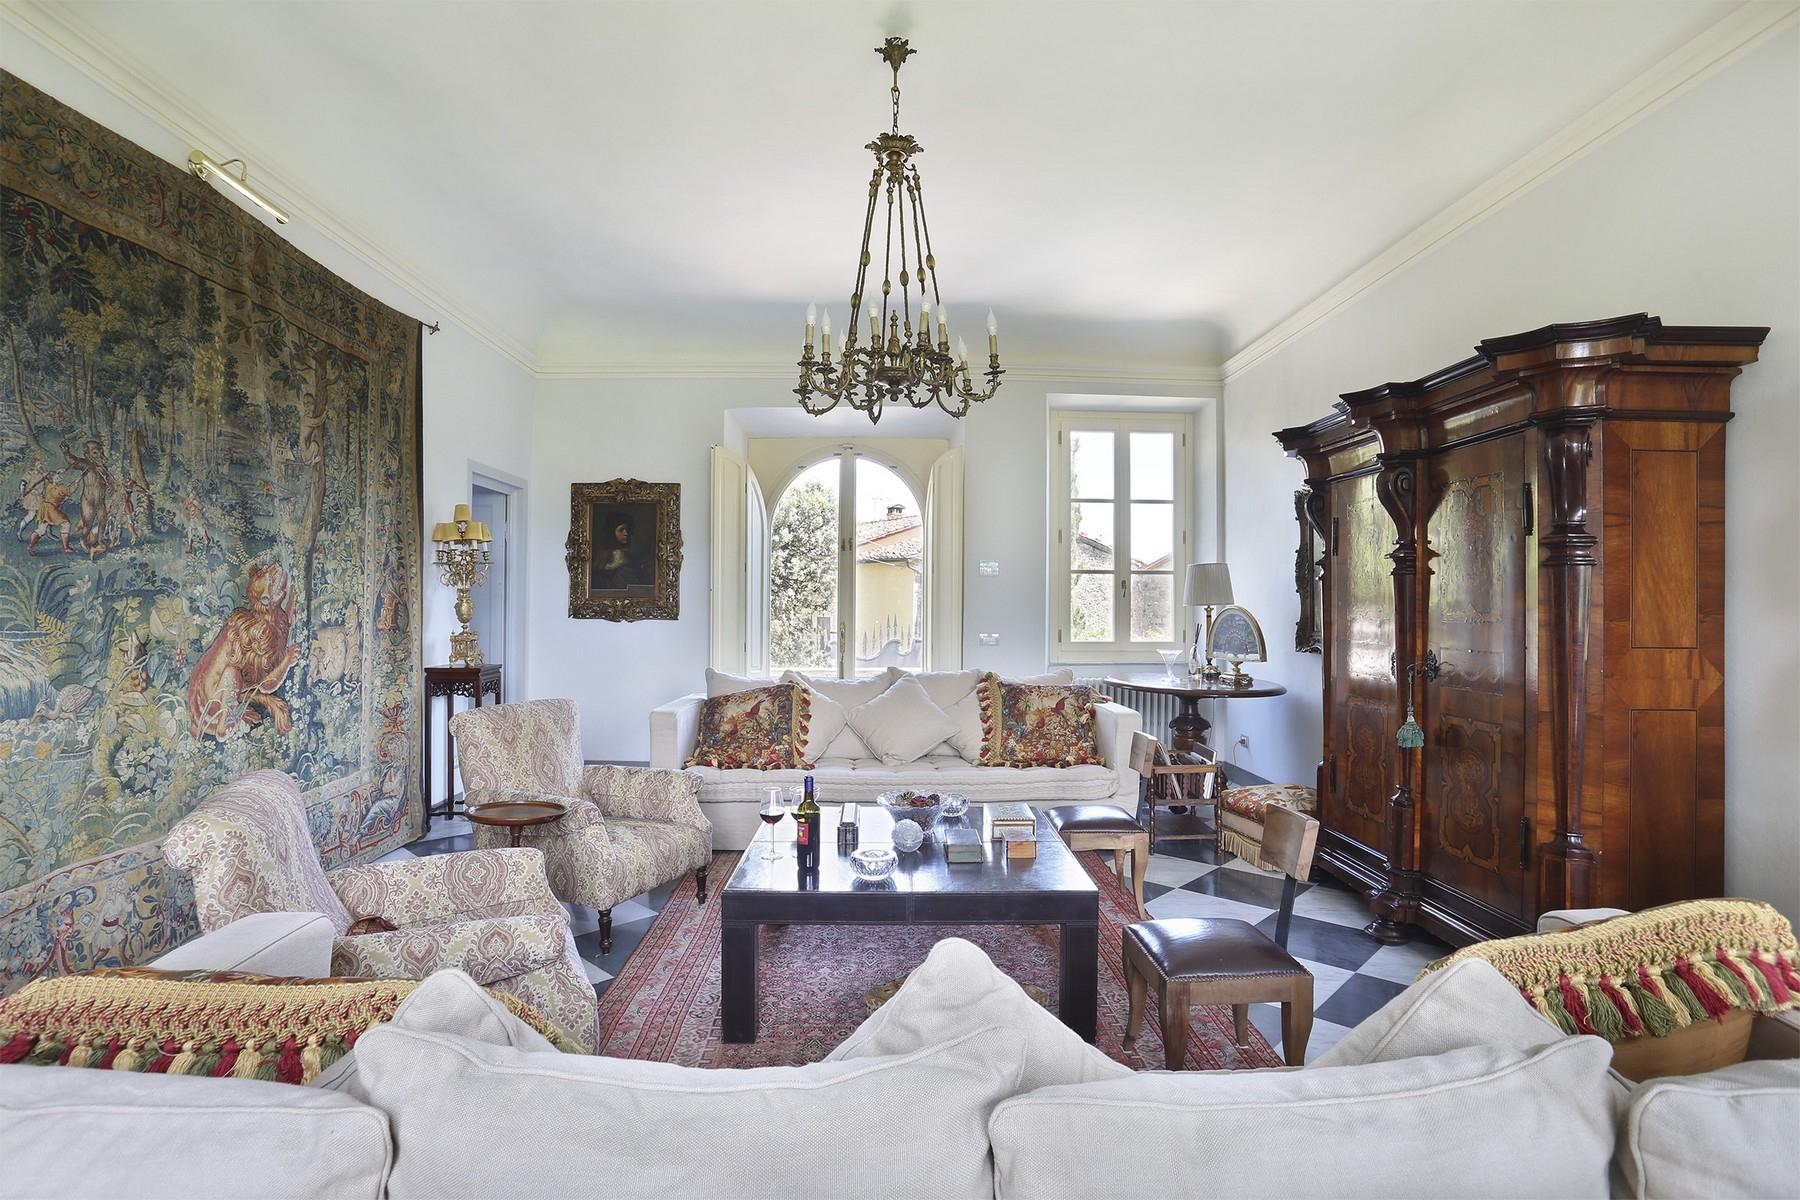 Villa in Vendita a Lucca: 5 locali, 735 mq - Foto 21